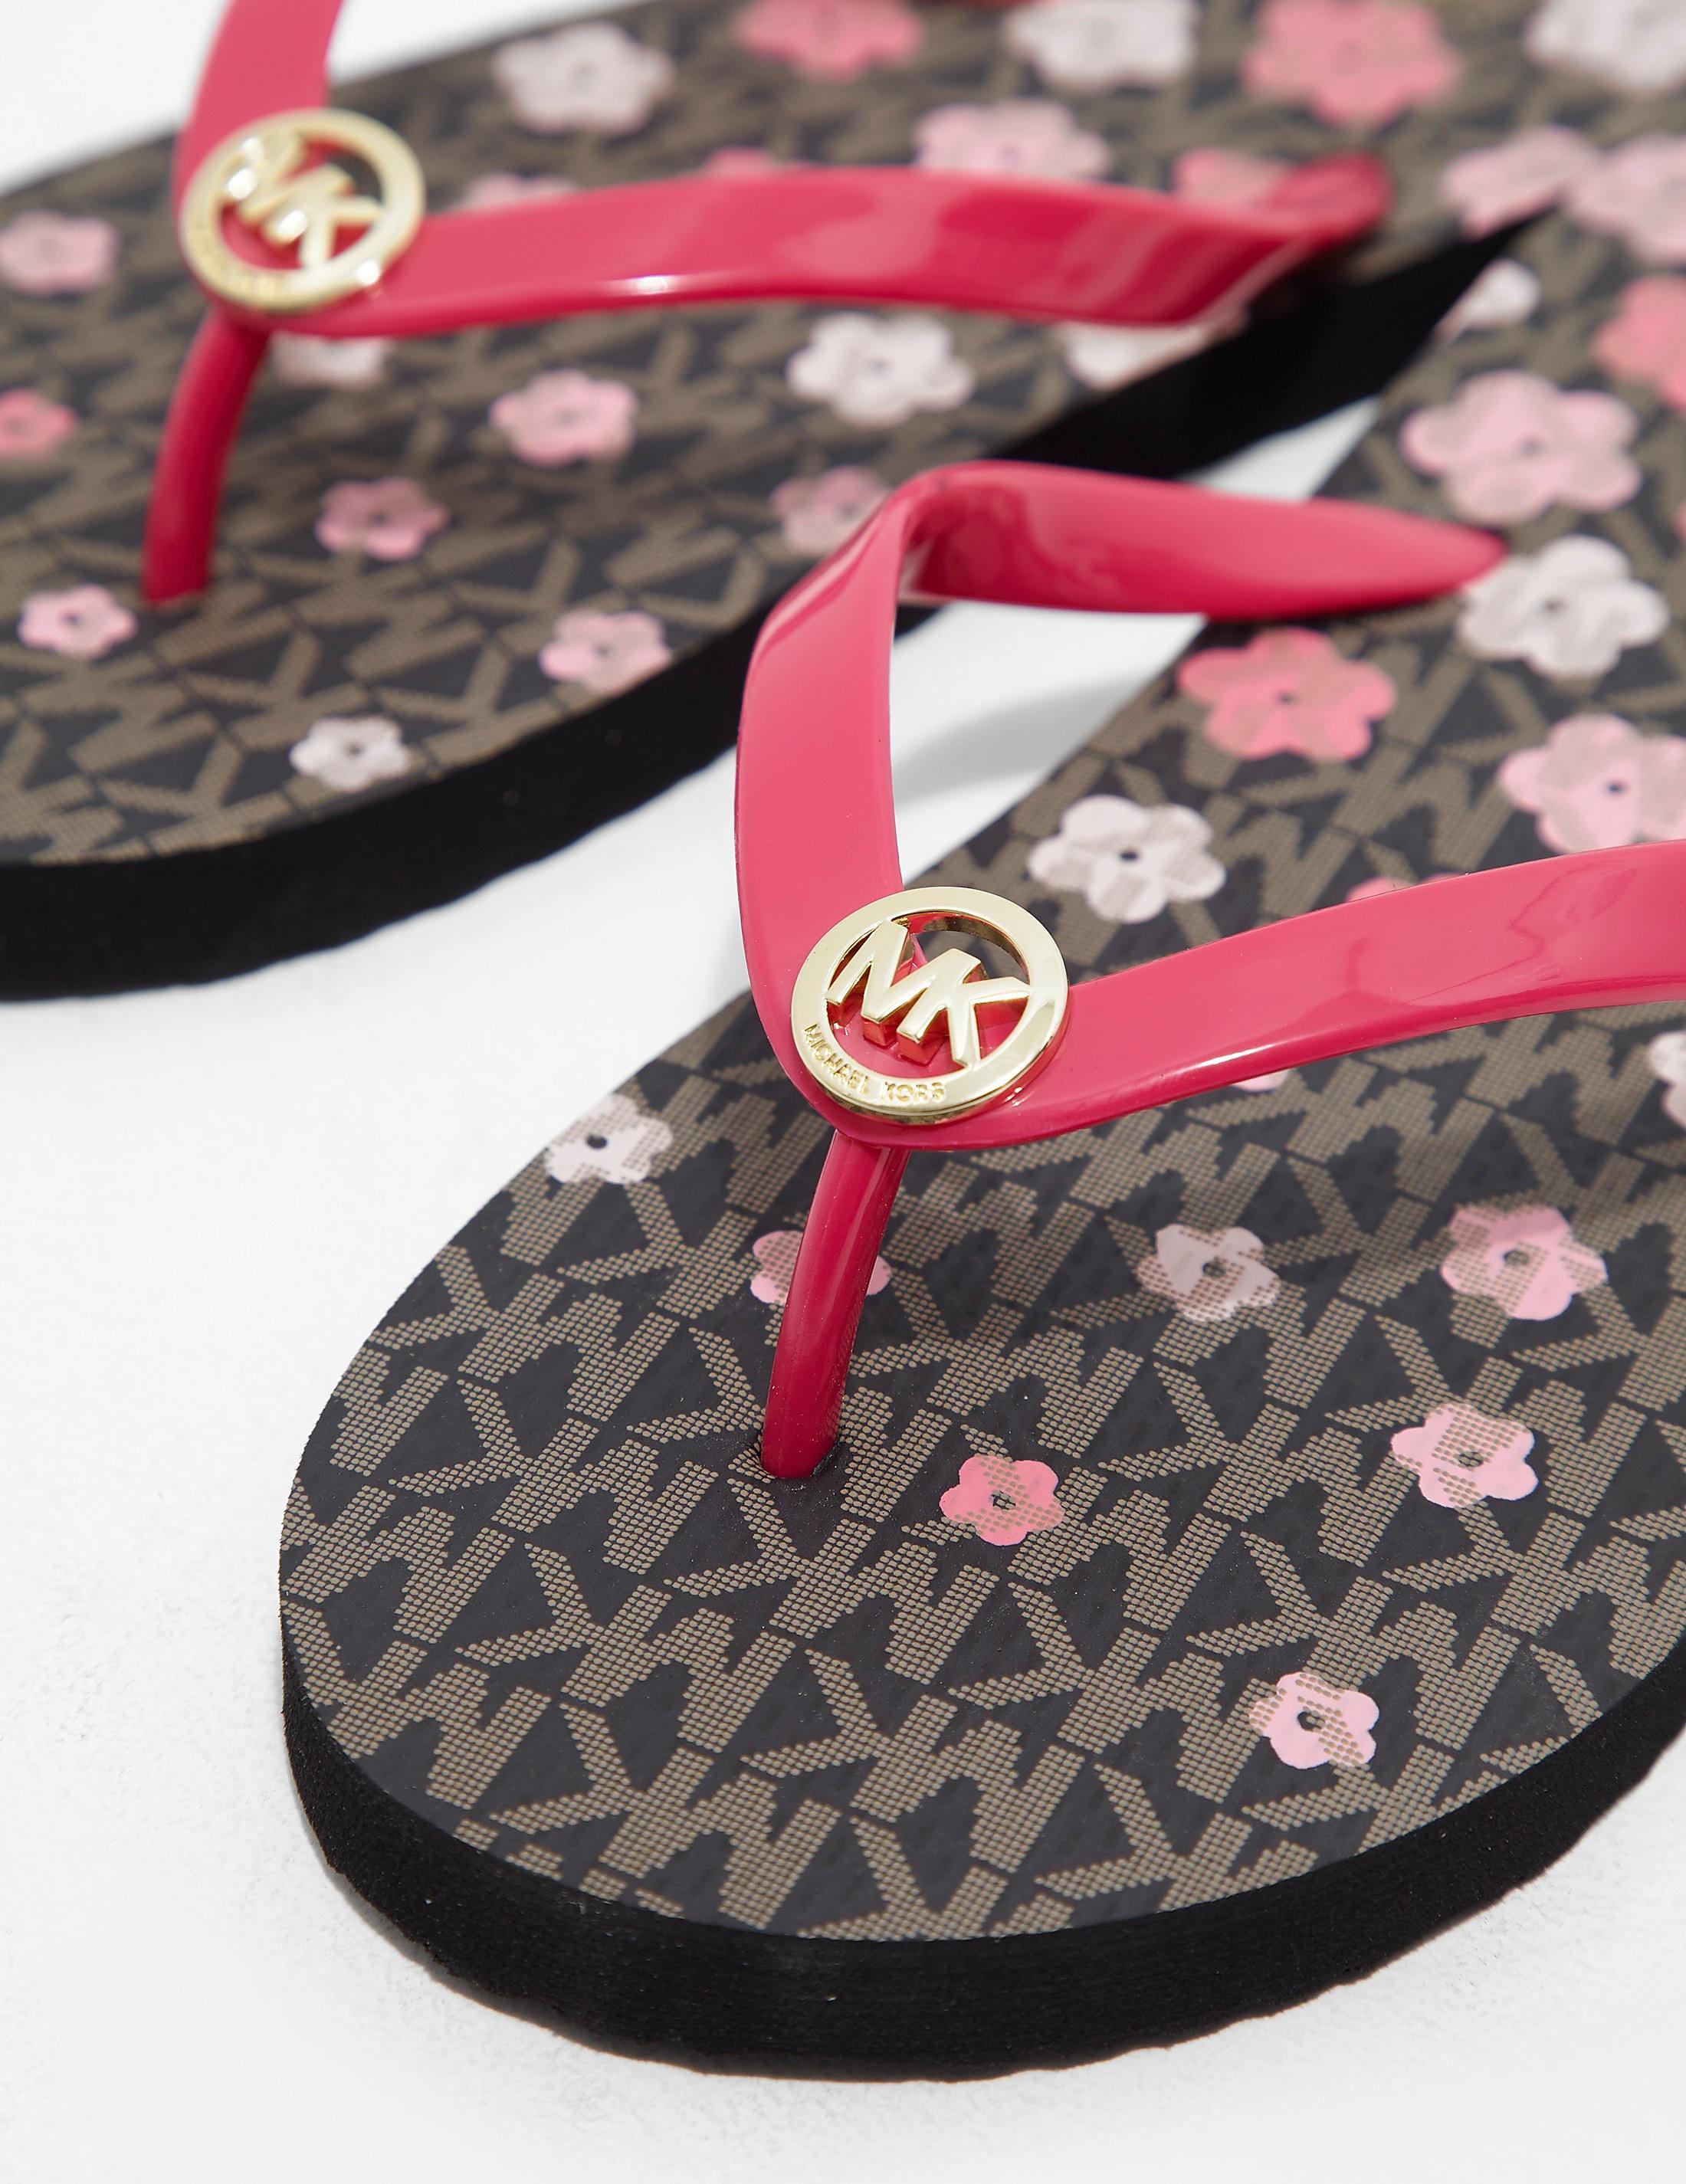 Michael Kors Flower Flip Flop